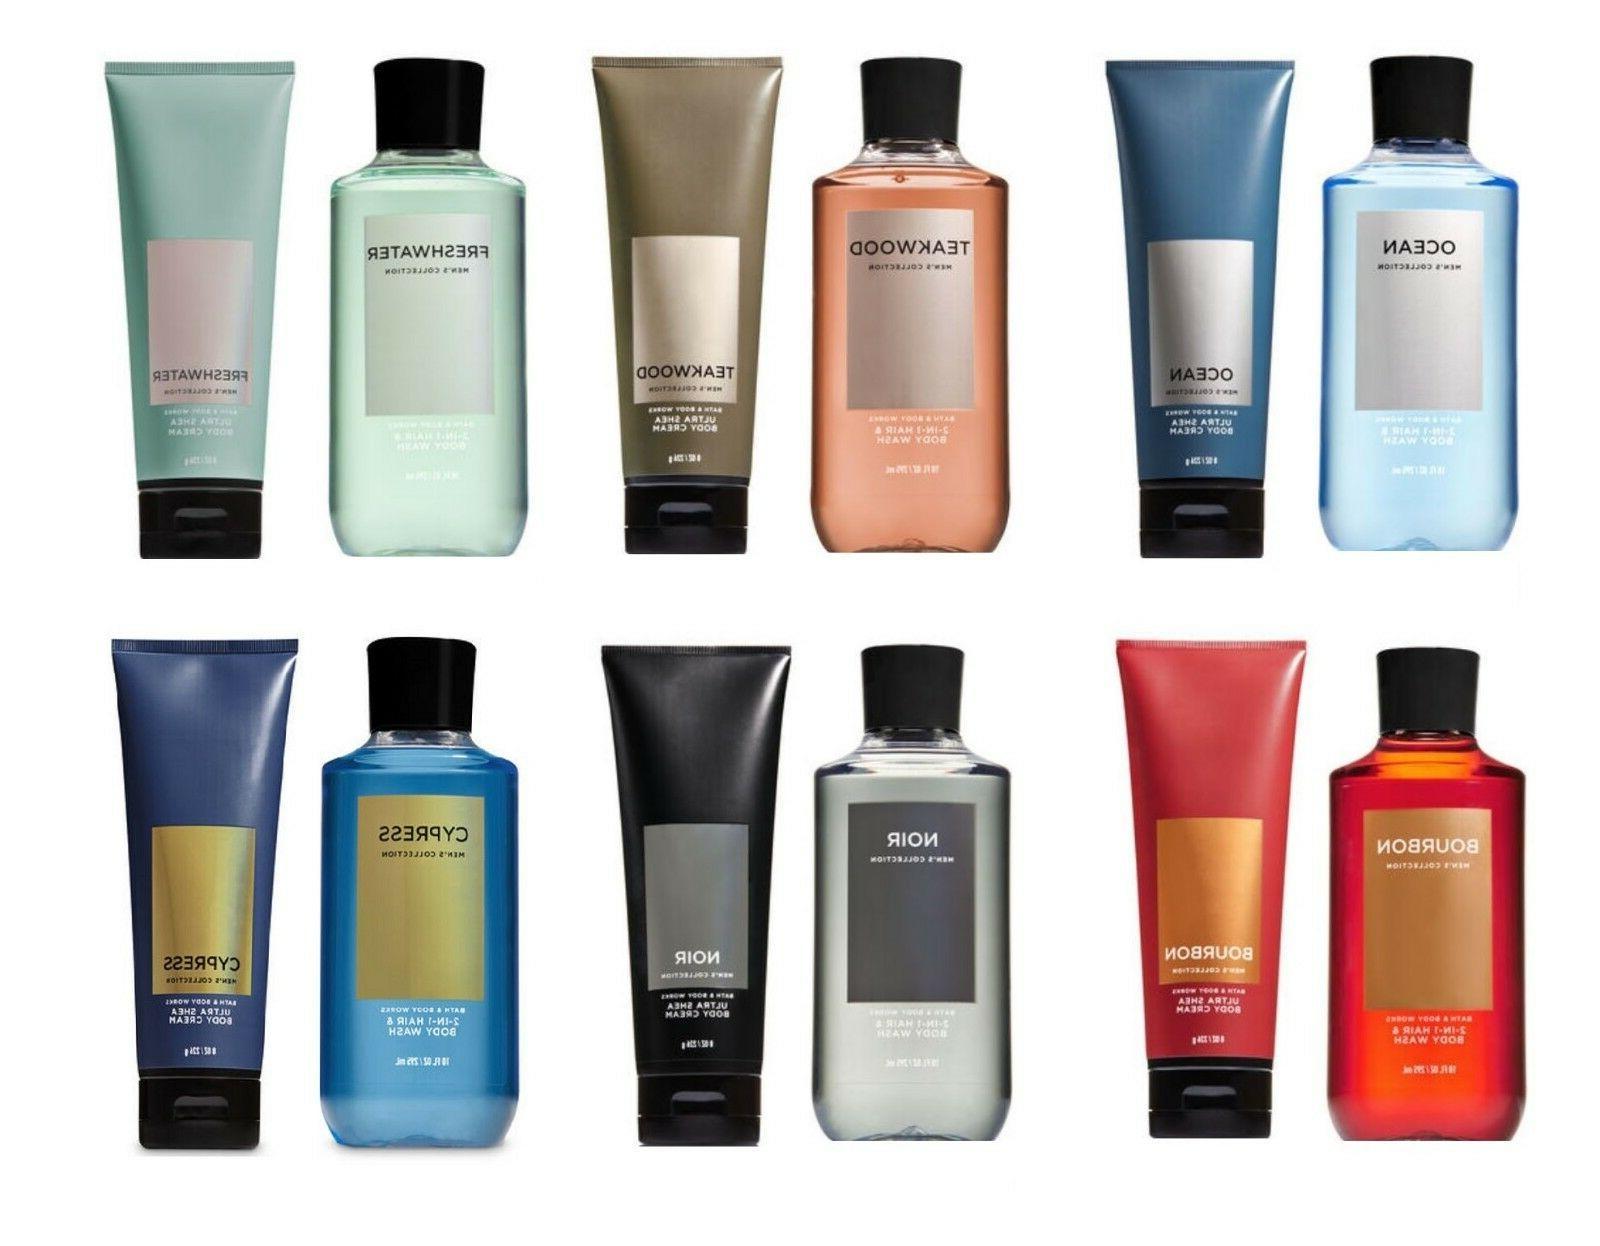 Bath and Body Works Men Set Body Cream & 2-in-1 Hair + Body